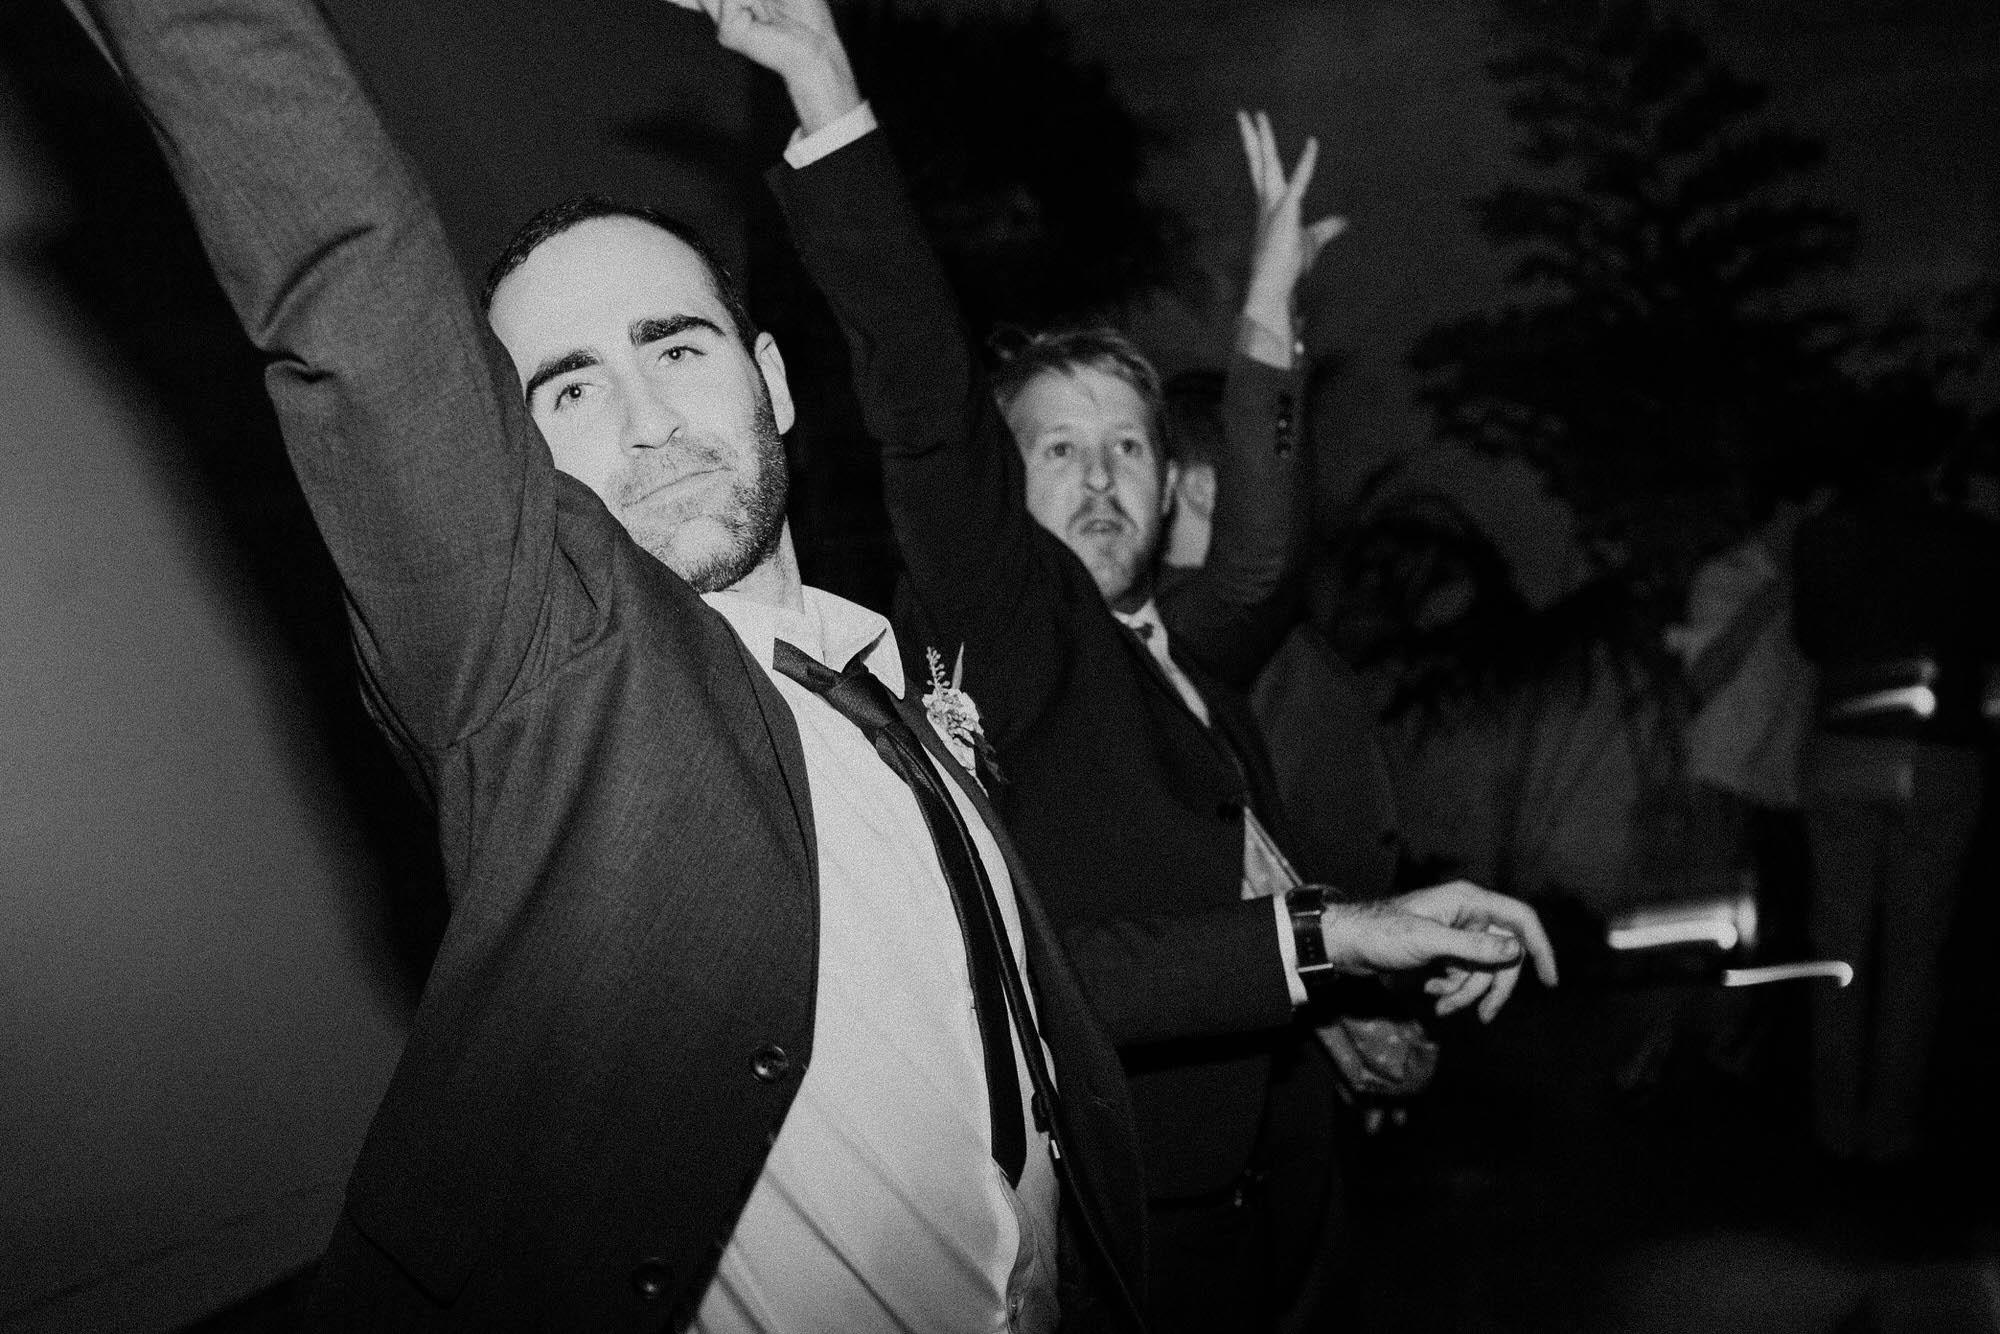 los-angeles-wedding-photographer-millwick-128.jpg